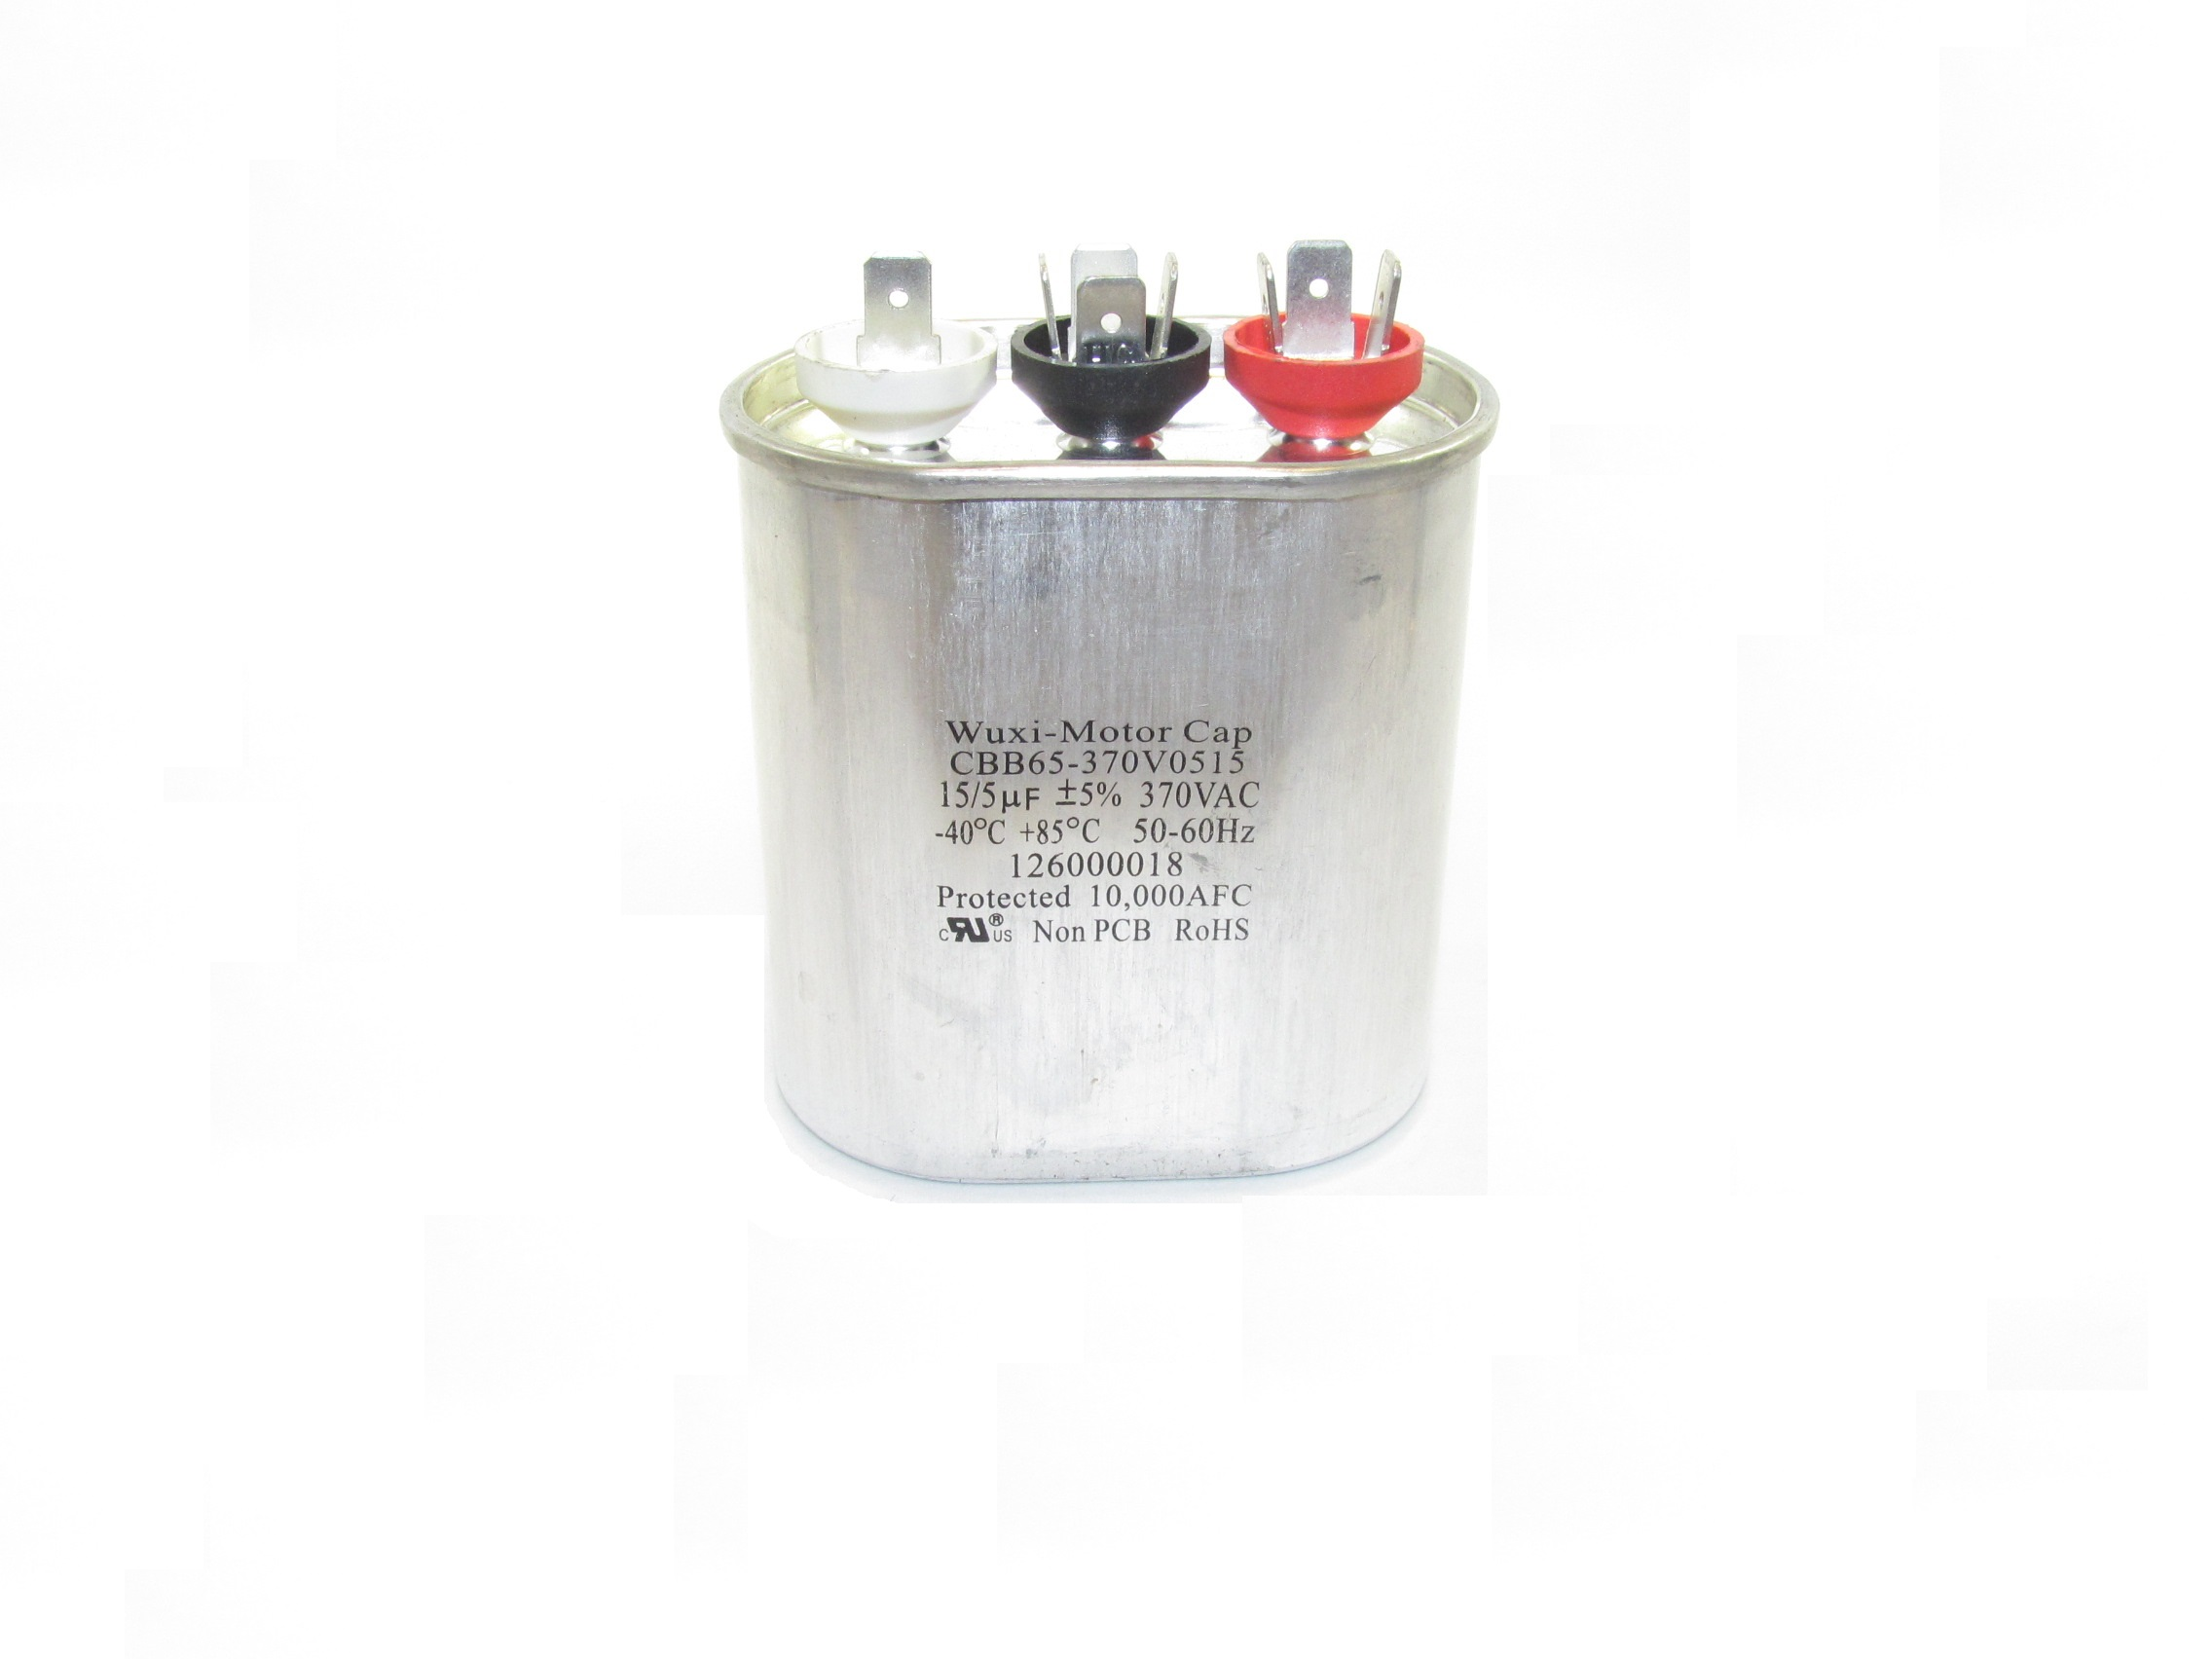 CBB65 Motor Run Capacitors (Oval-Shaped, Dual Capacitance Value)